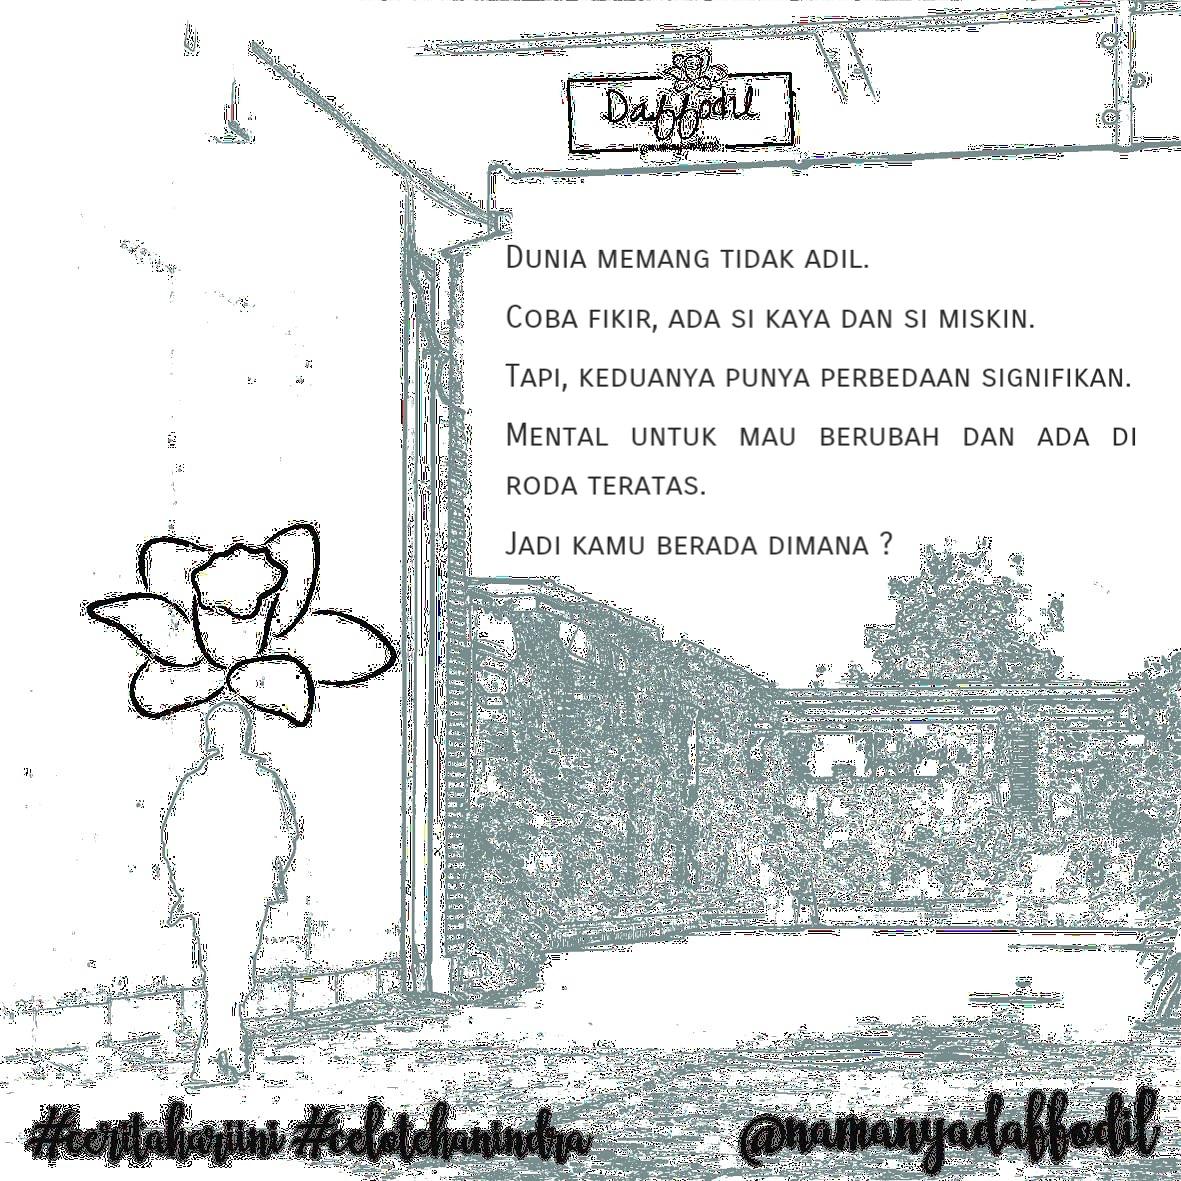 #ceritahariini #celotehanindra #bukankutipansenja #namanyadaffodil #puisi #puisicinta #puisirindu #puisihati #sajak #sajakcinta #sajakrindu #sajakpuisi #sajakhati #cerita #ceritaku #ceritahati #kumpulanpuisi #kumpulan_puisi #kumpulansajak #budaksajak #katakata #katakatacaptionpic.twitter.com/QT2quiIzrk